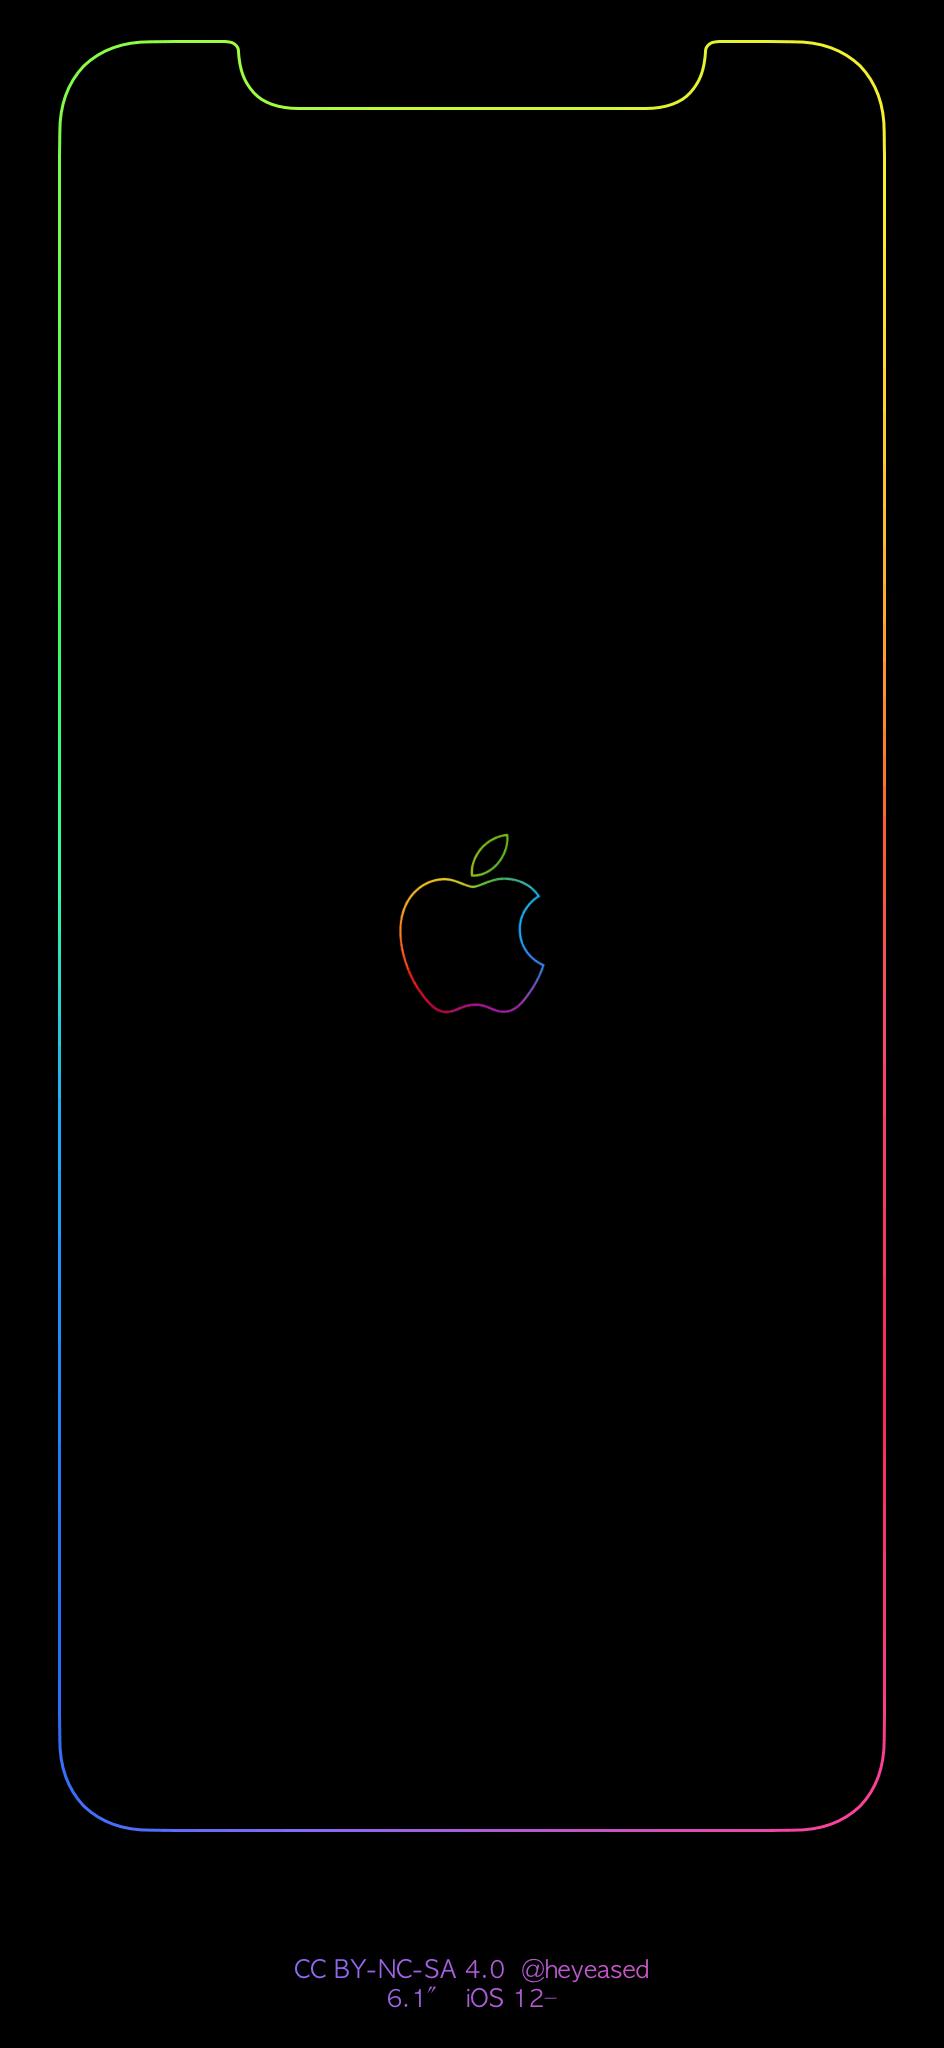 Apple Iphone Symbol 4k Wallpapers Wallpaper Cave